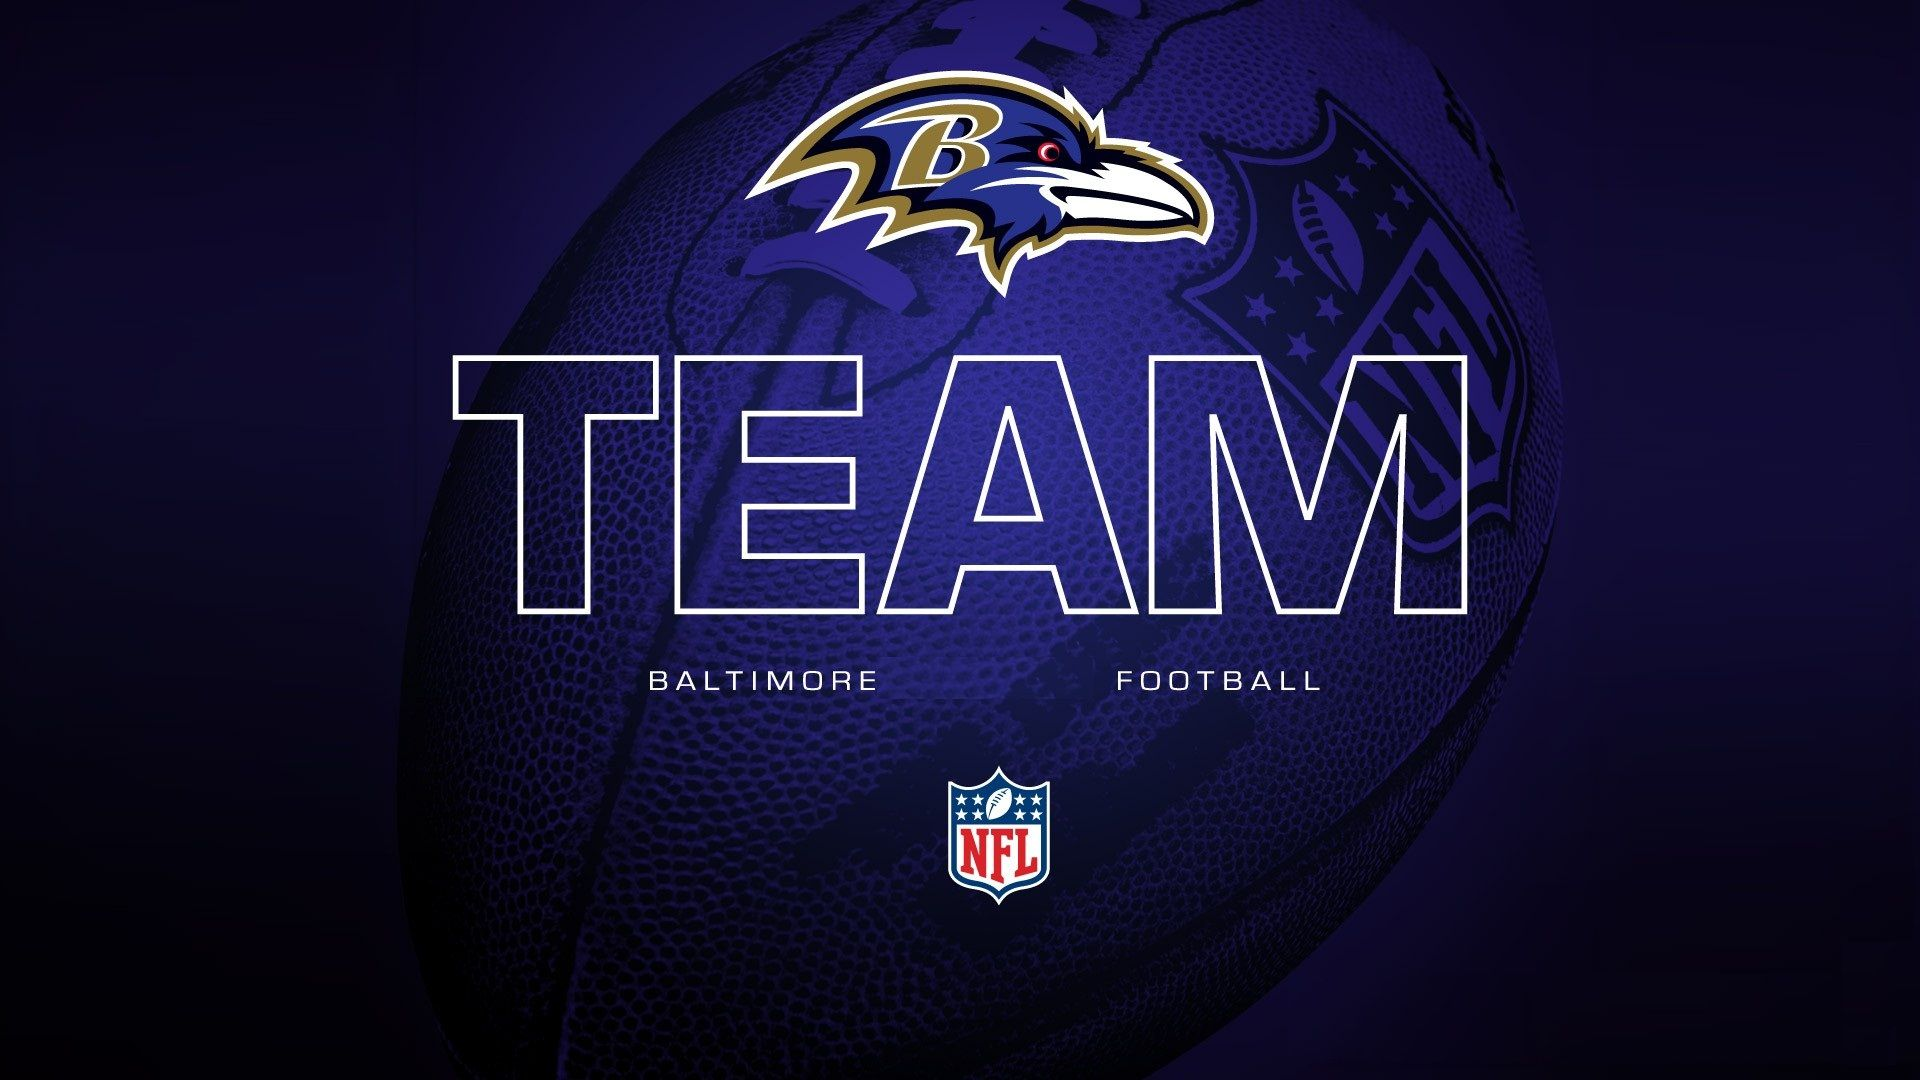 Wallpapers Baltimore Ravens 2021 Nfl Football Wallpapers Baltimore Ravens Logo Baltimore Ravens Nfl Football Wallpaper